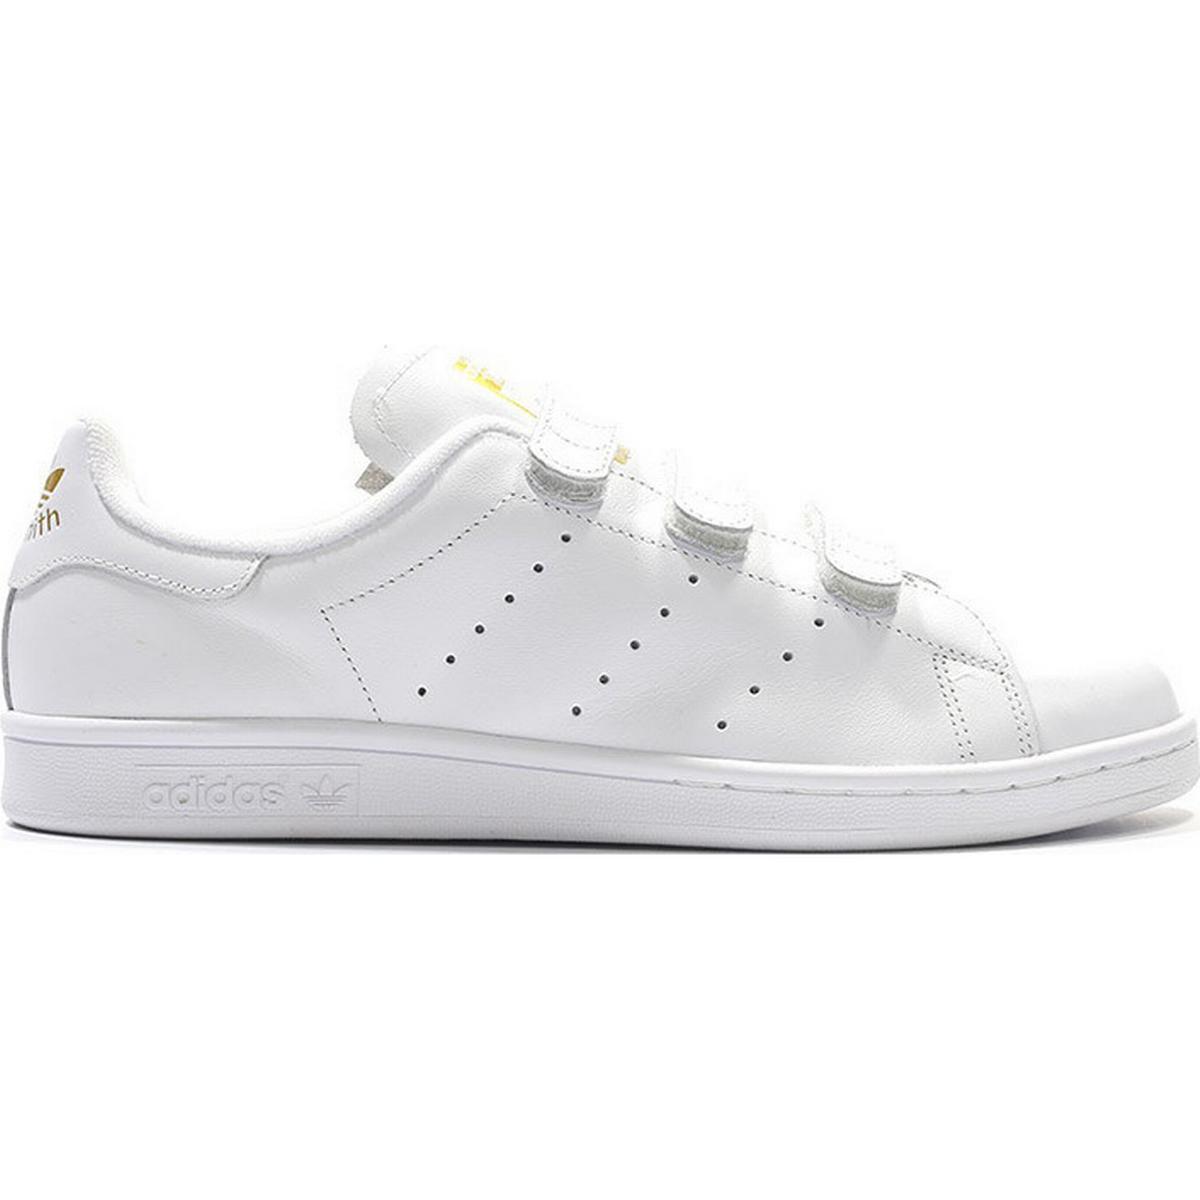 adidas Velcro Shoes for Men White Size 8 UK : Buy Online